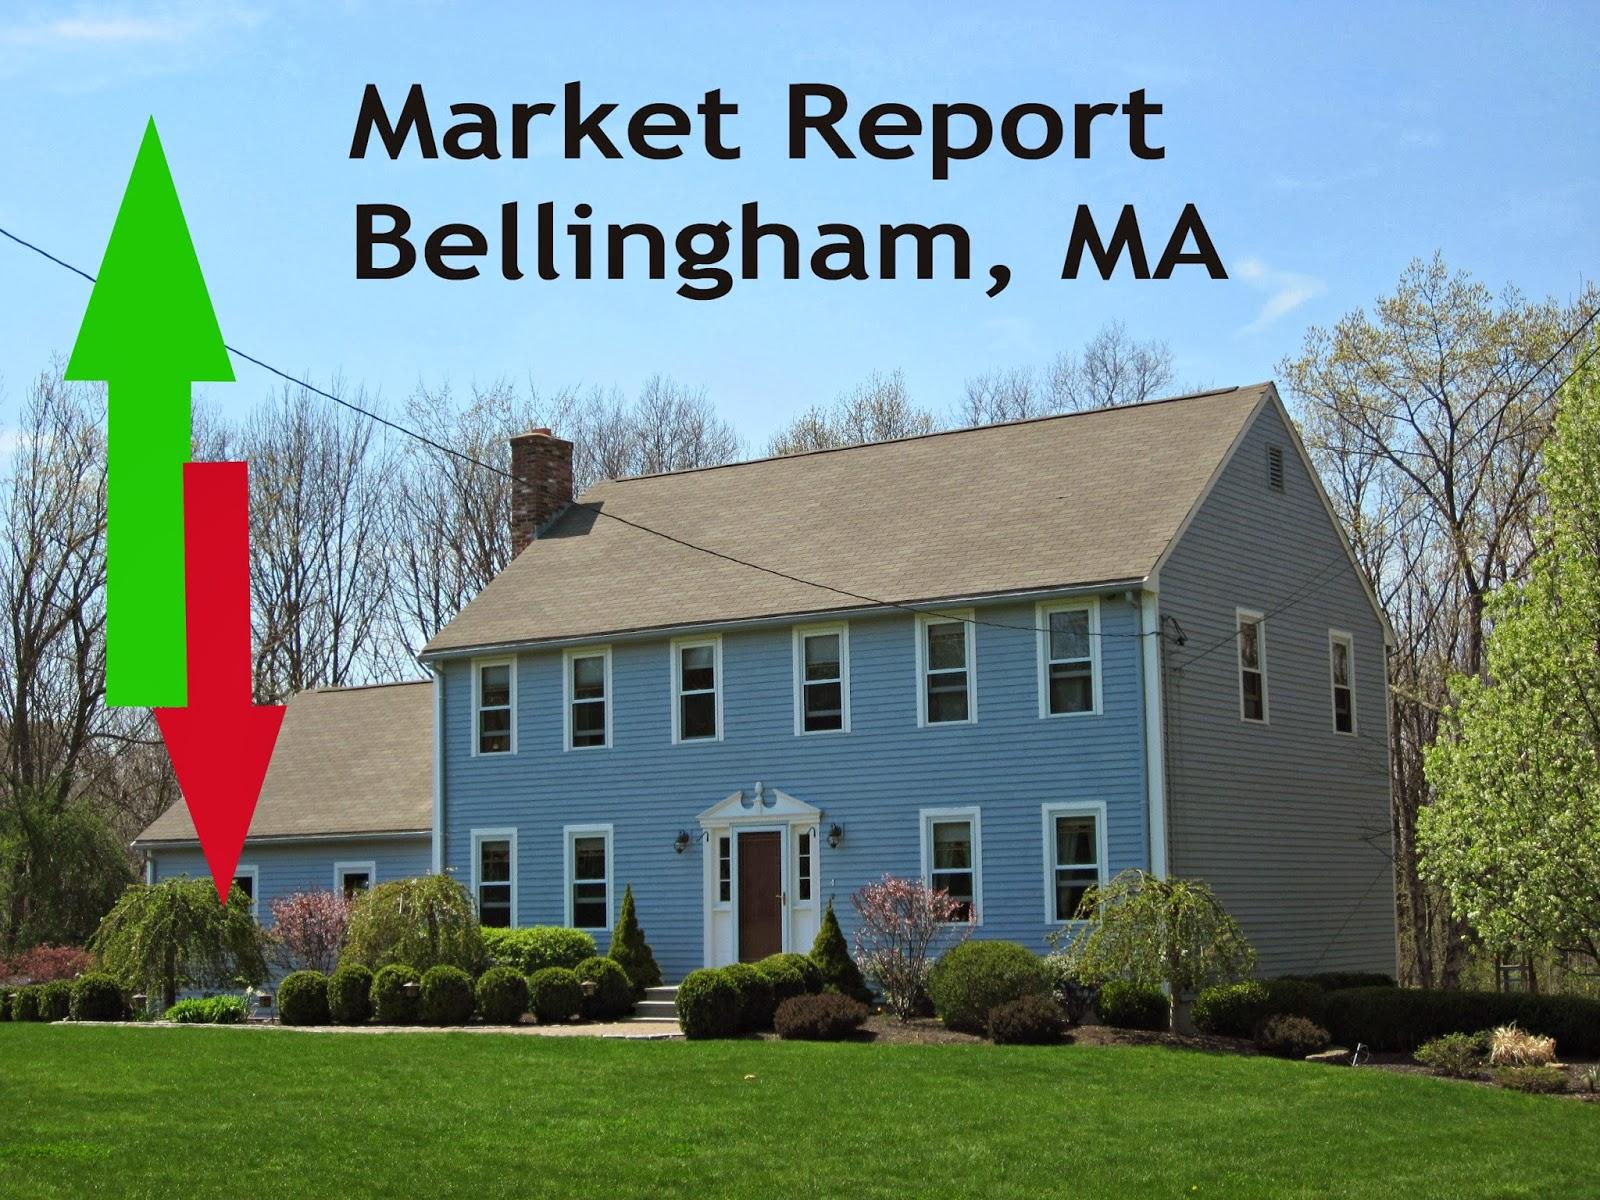 Bellingham MA market report